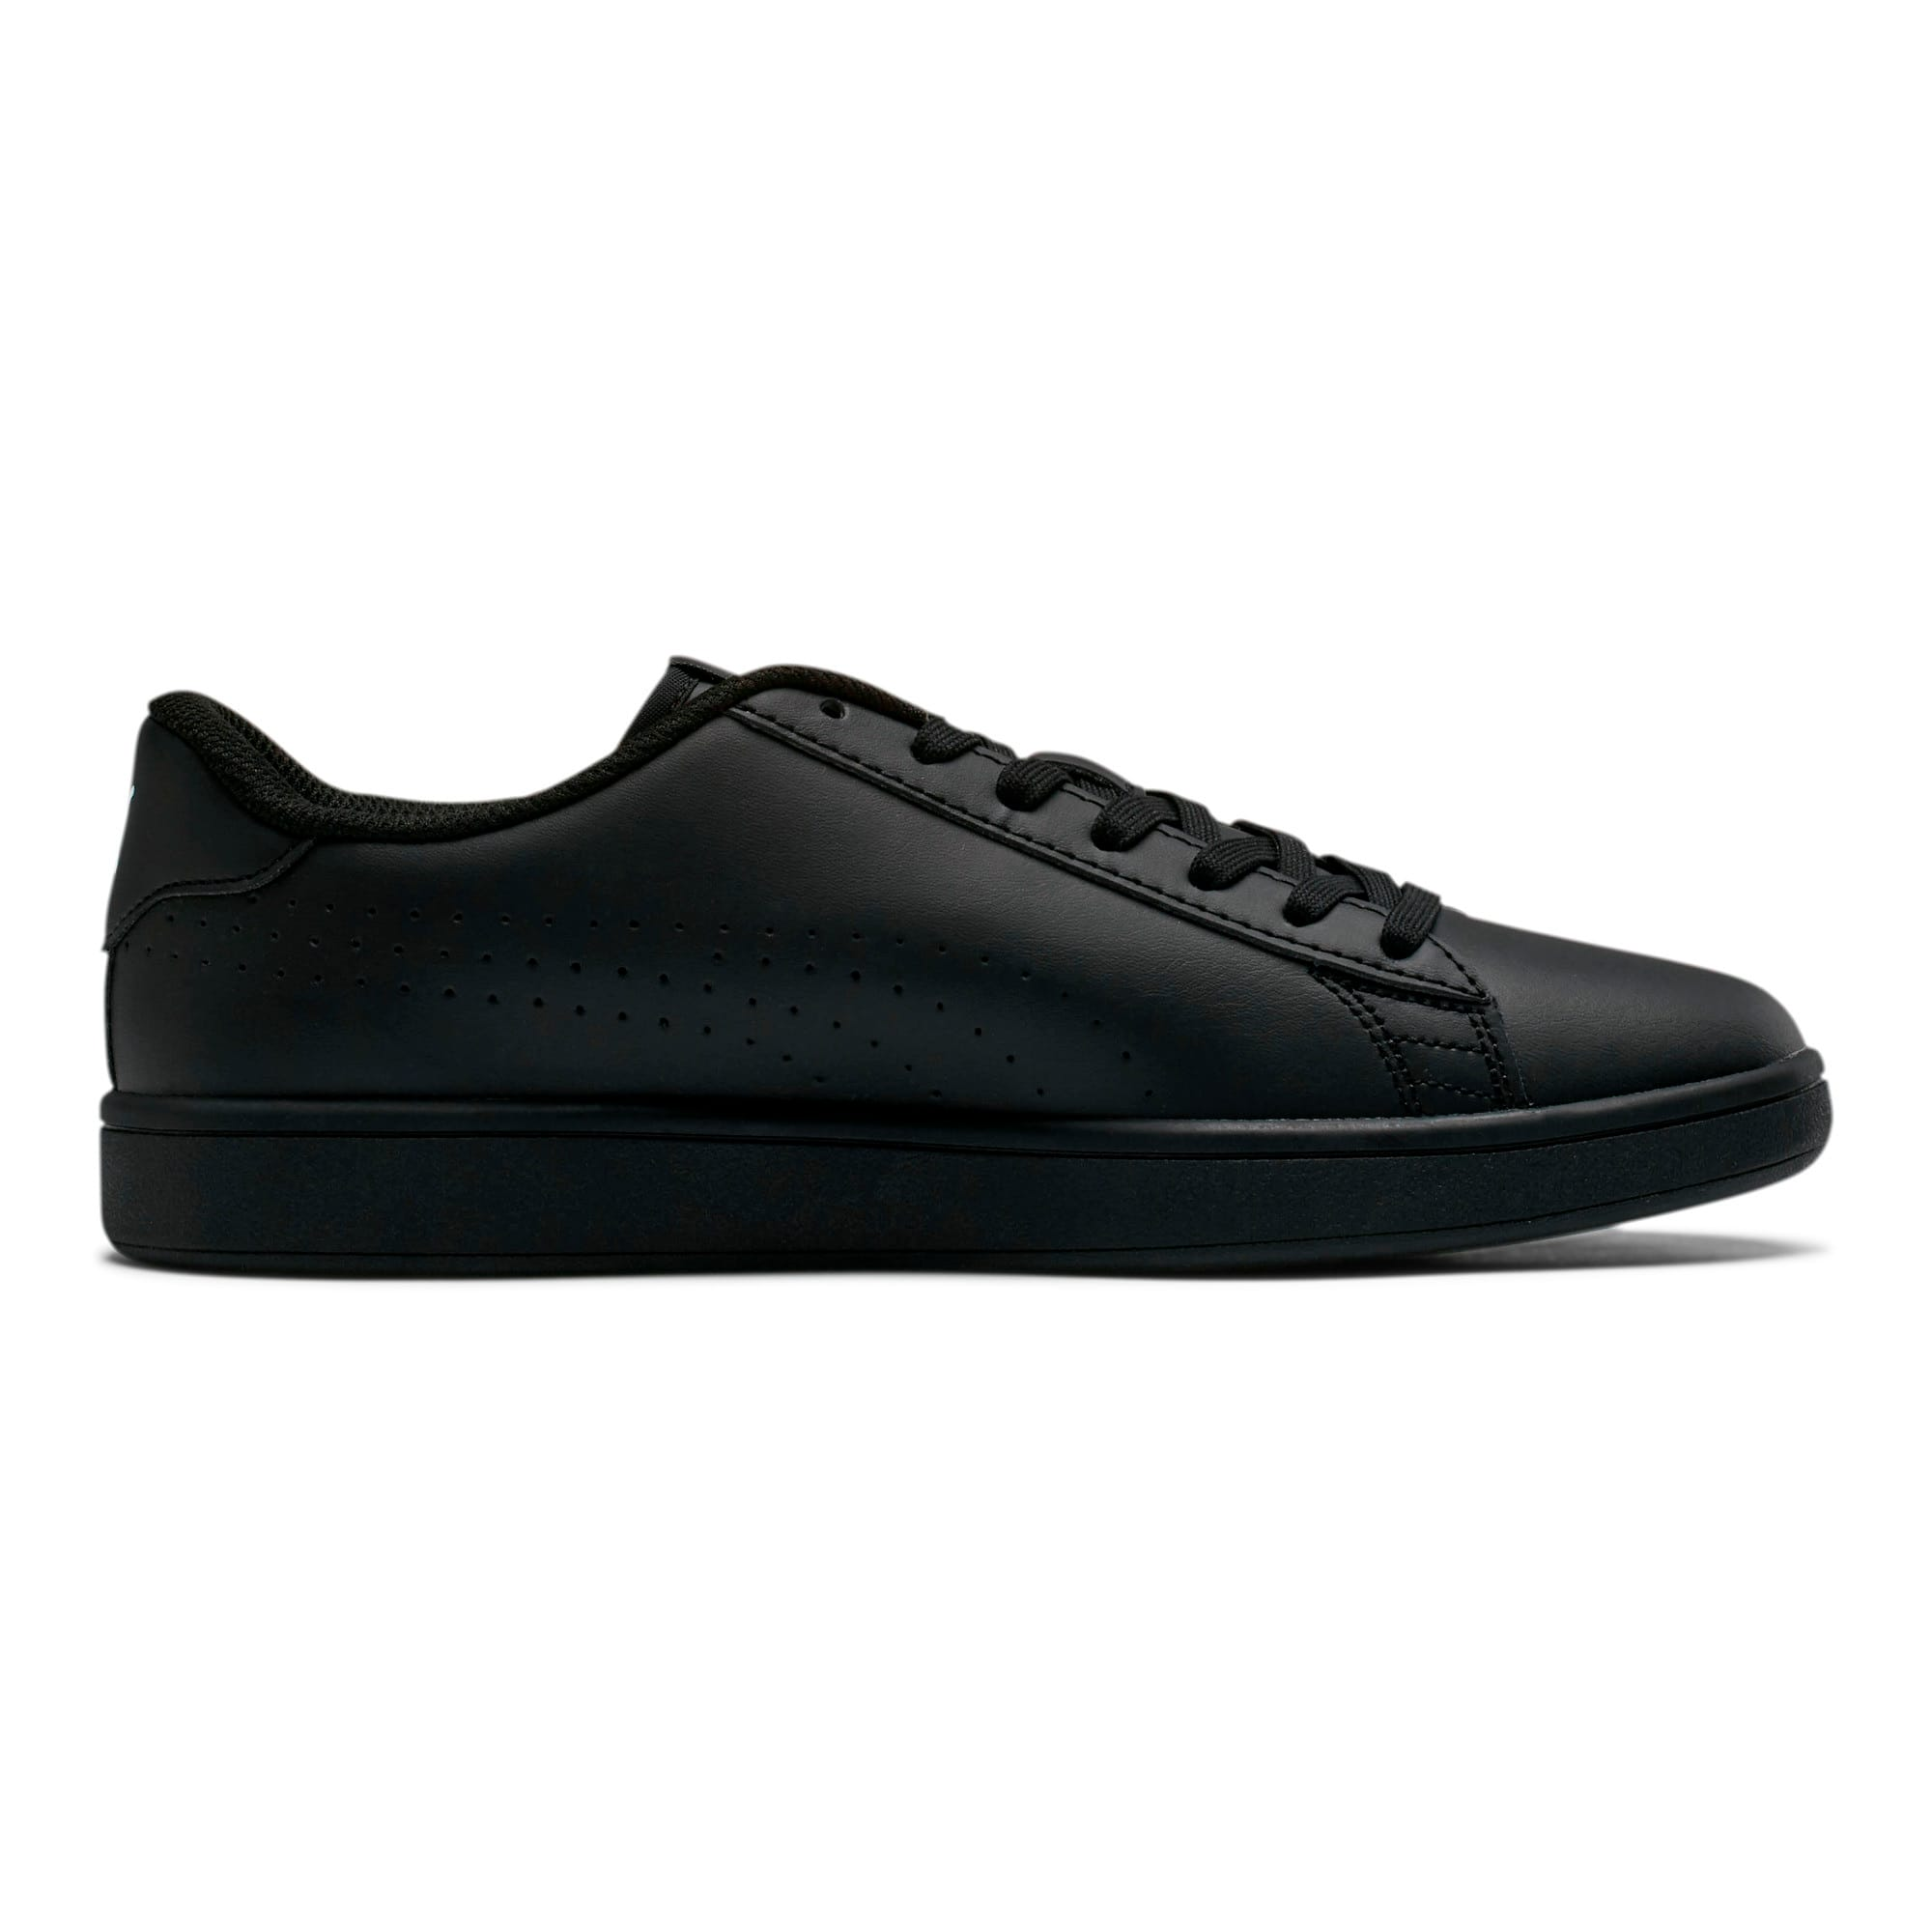 Thumbnail 5 of PUMA Smash v2 Leather Perf Sneakers, Puma Black-Puma Black, medium